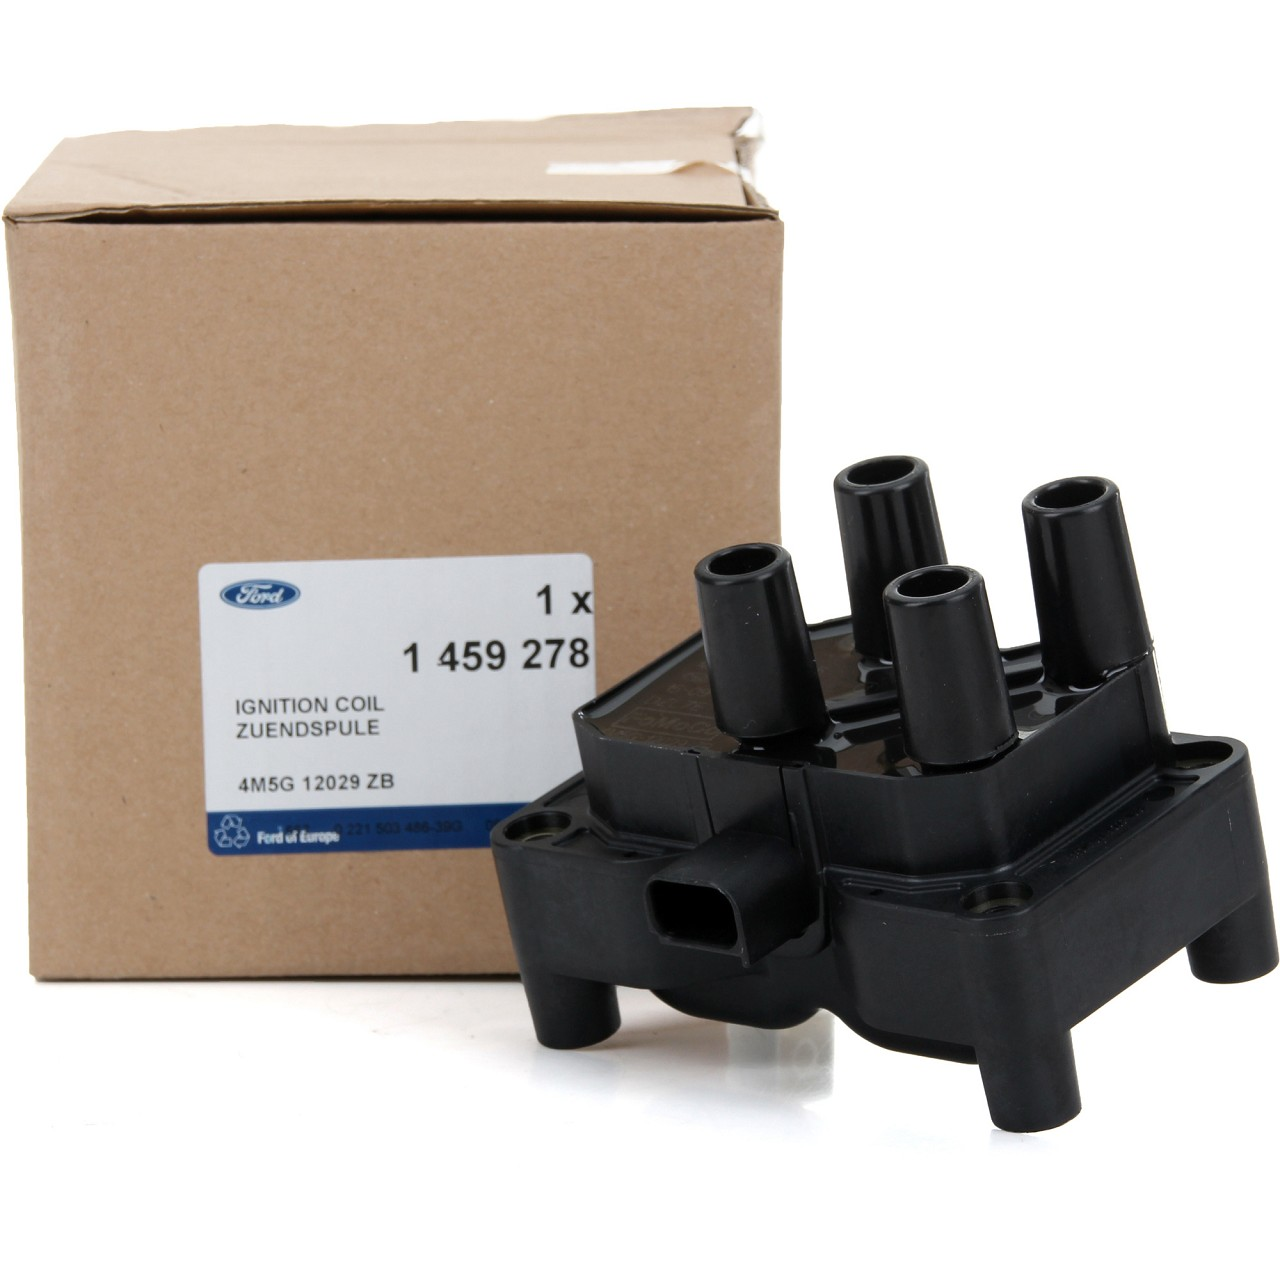 ORIGINAL Ford Zündspule Zündmodul 3-polig B-/C-MAX FIESTA FOCUS MONDEO 1459278